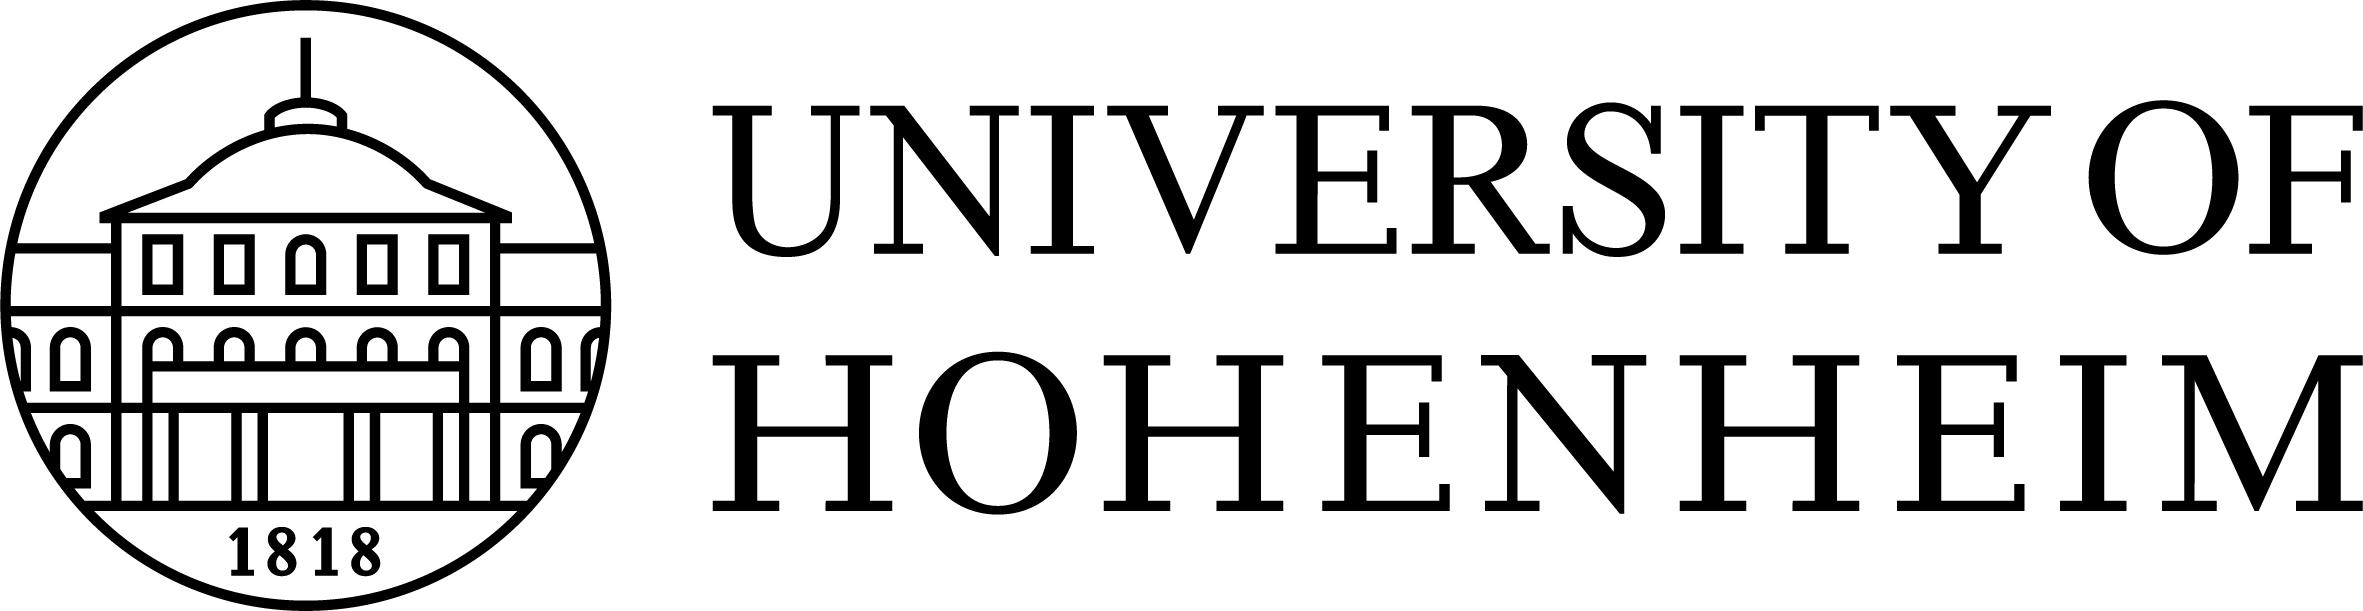 University of Hohenheim: Study and research in Stuttgart